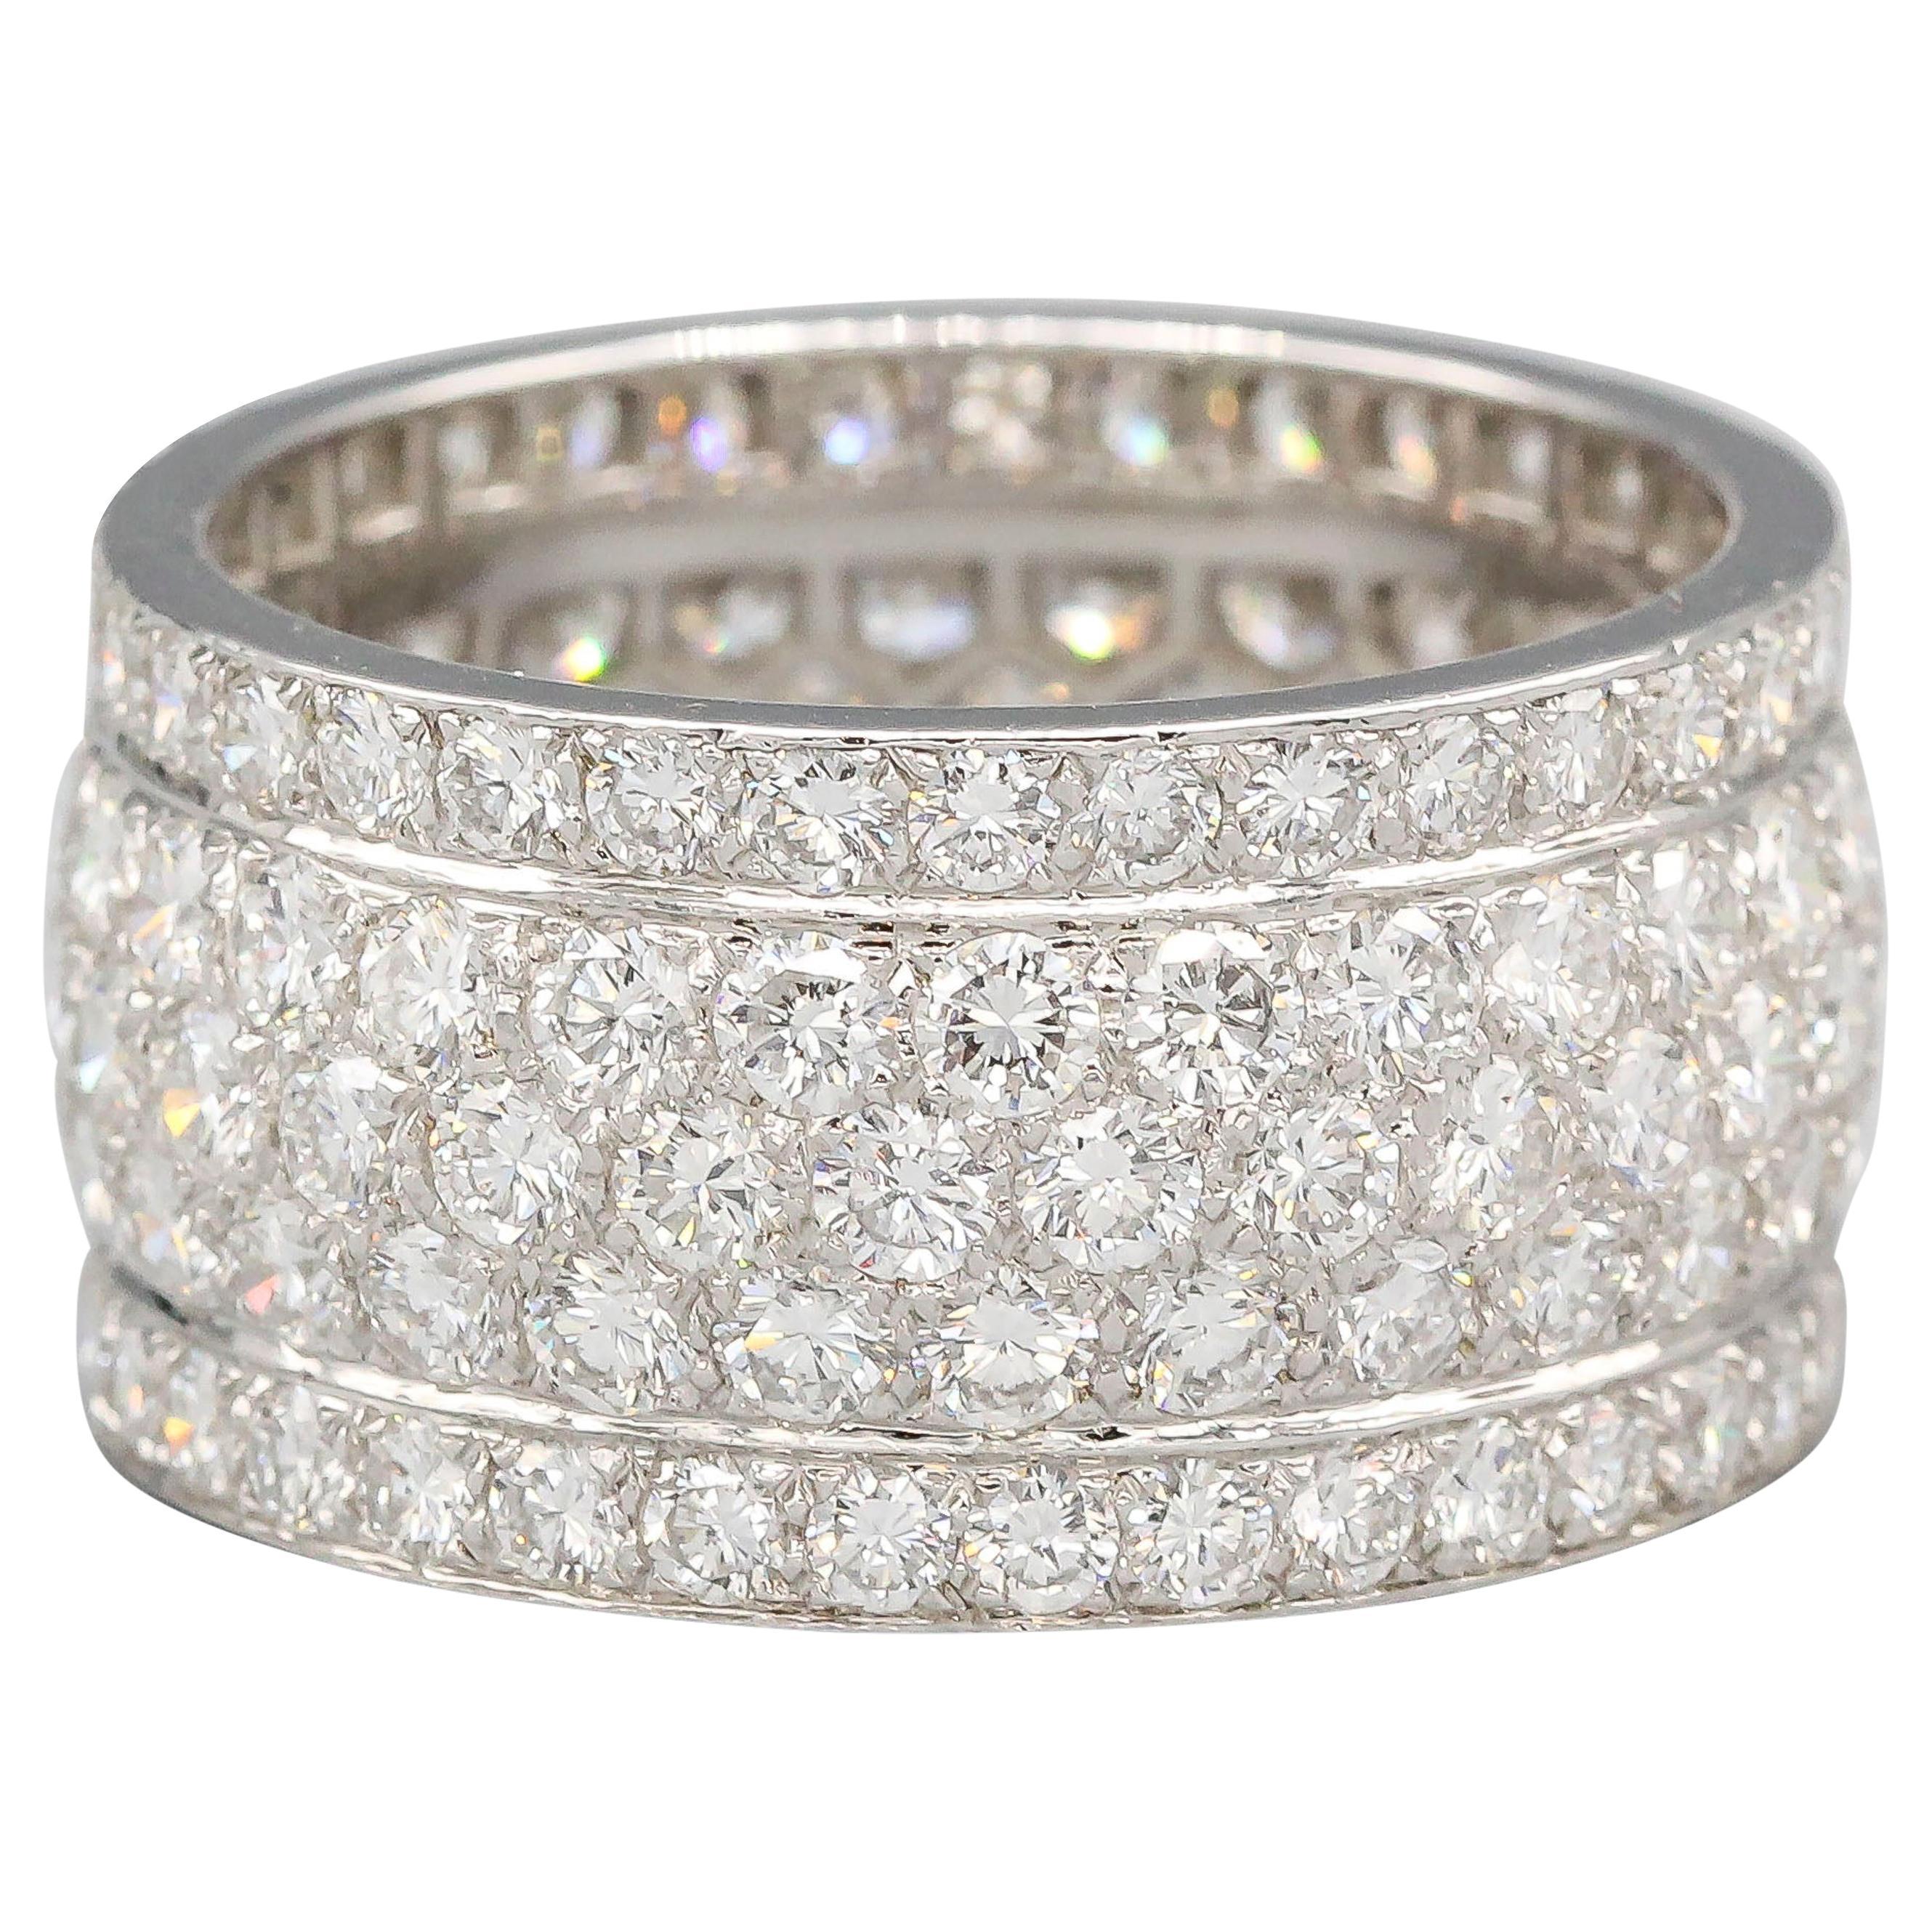 Cartier Five-Row Diamond 18 Karat White Gold Band